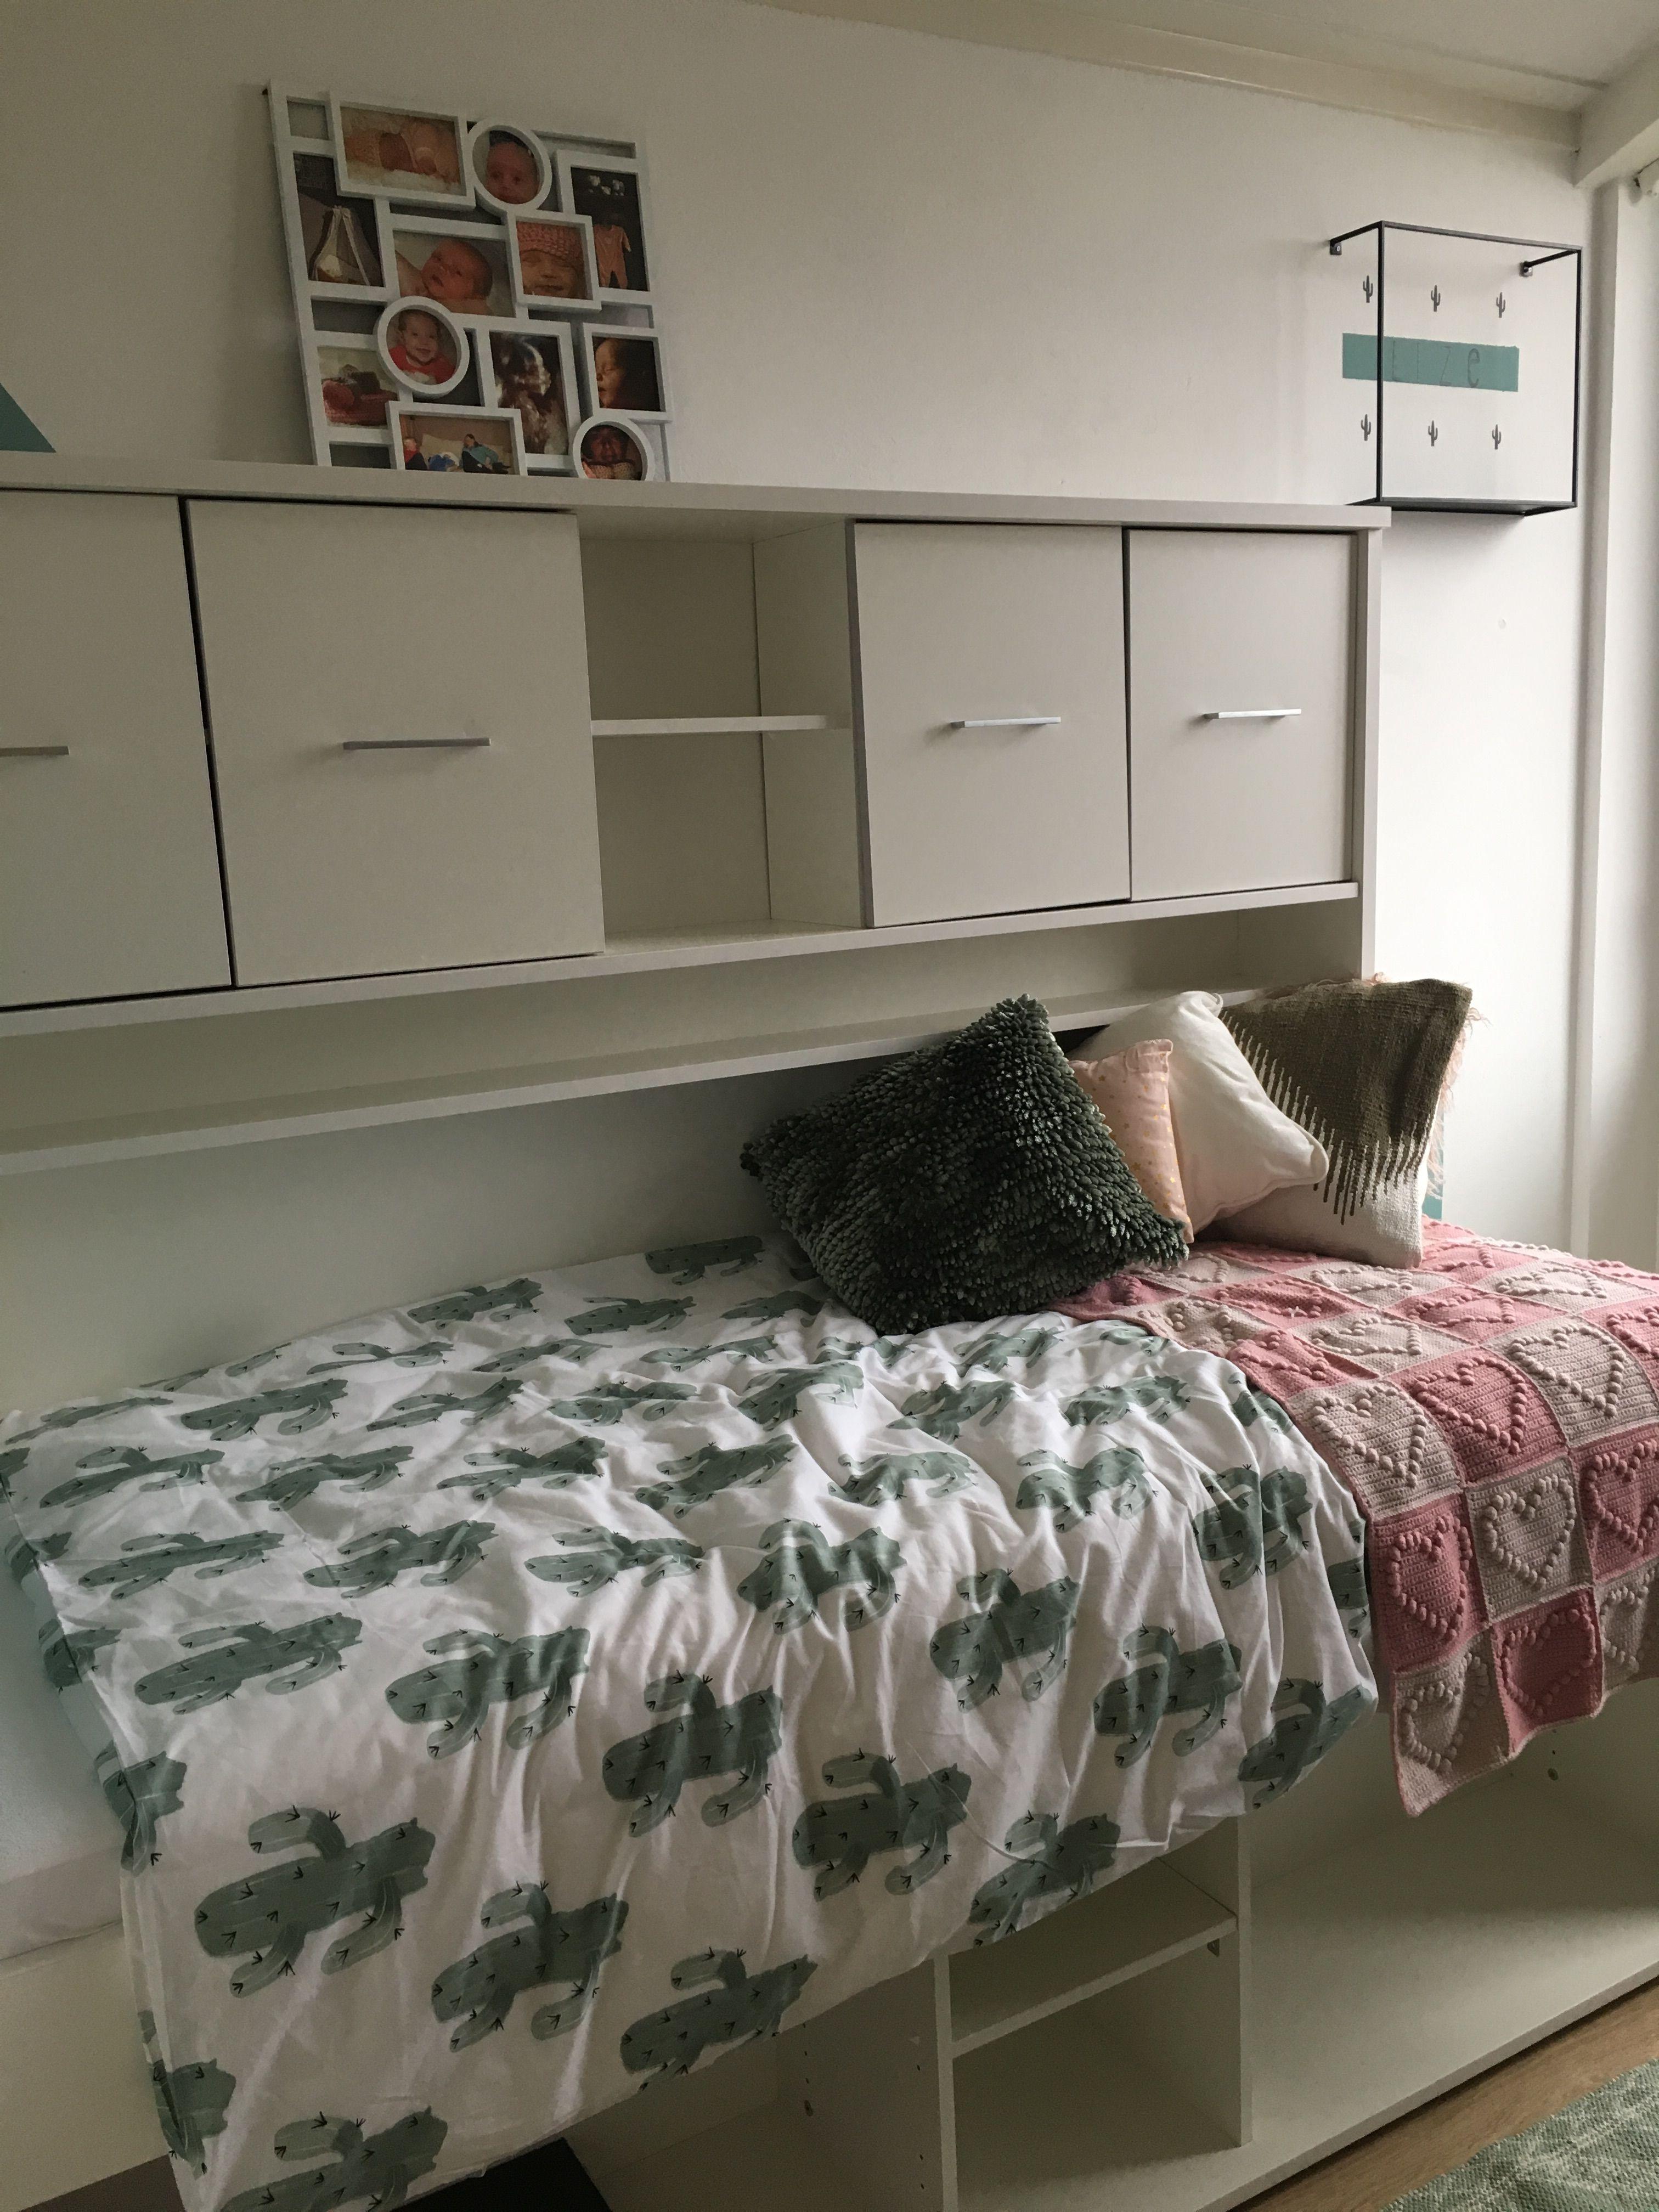 Roze Slaapkamer Accessoires.Groene Cactus Slaapkamer Met Roze En Gouden Accessoires